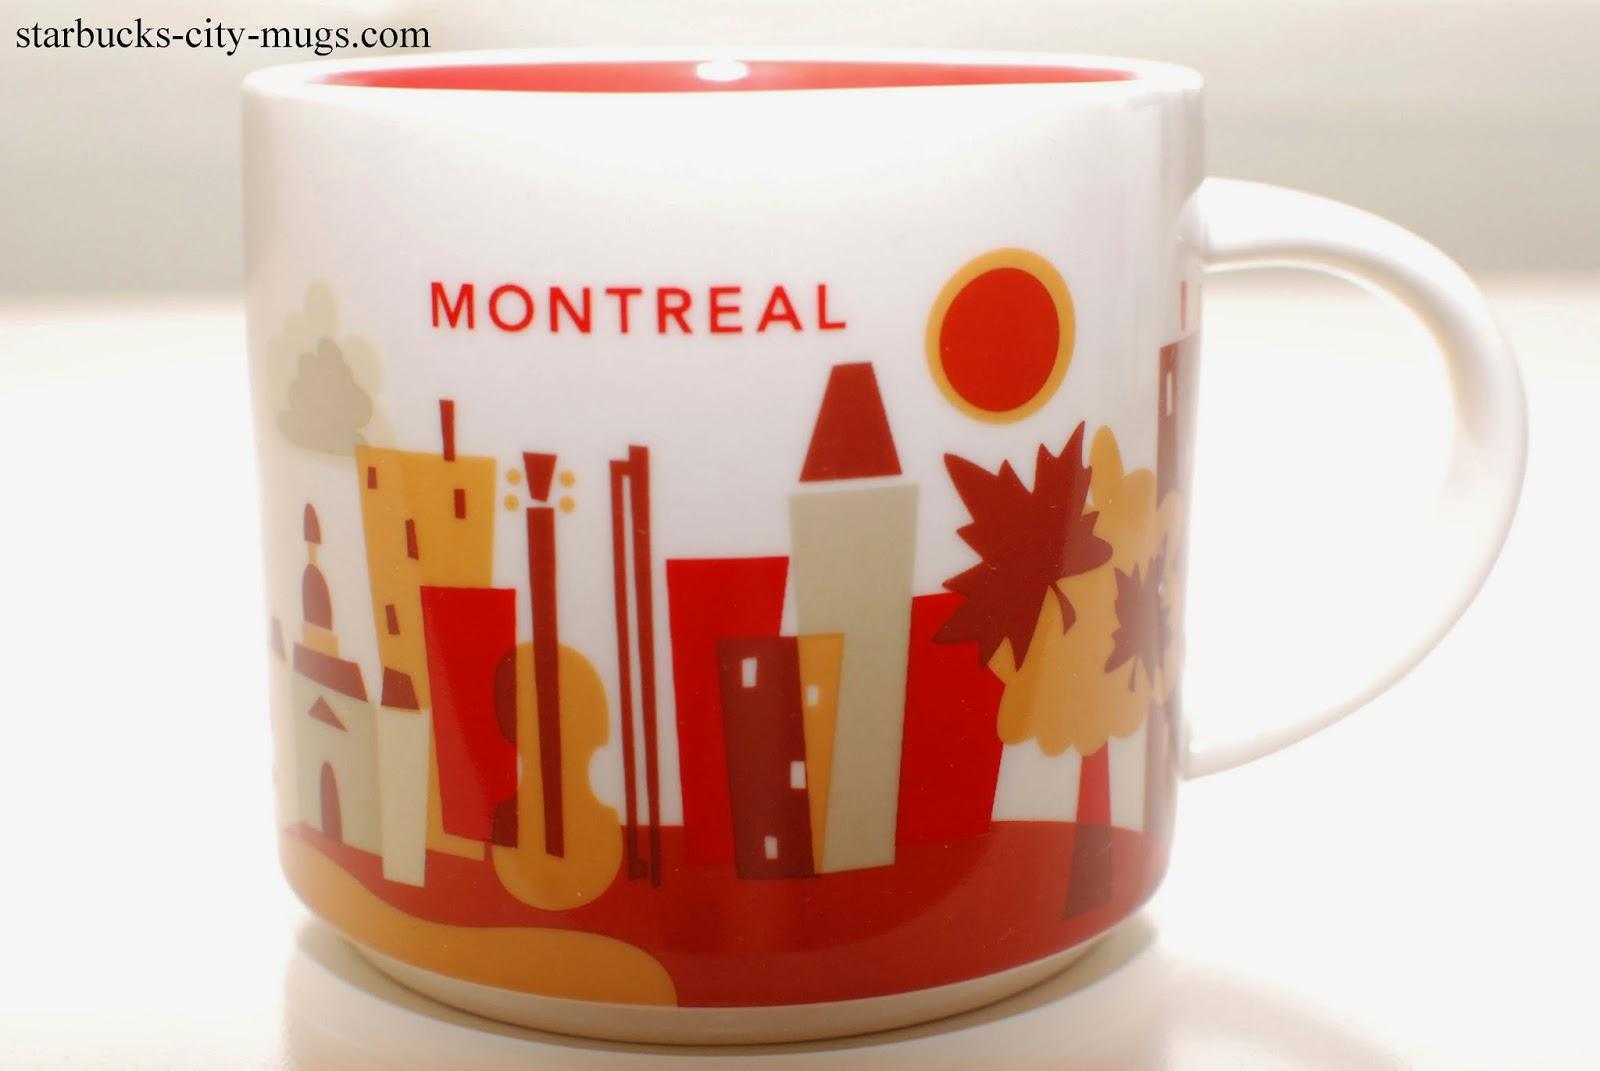 Starbucks City Mugs: Montreal You Are Here